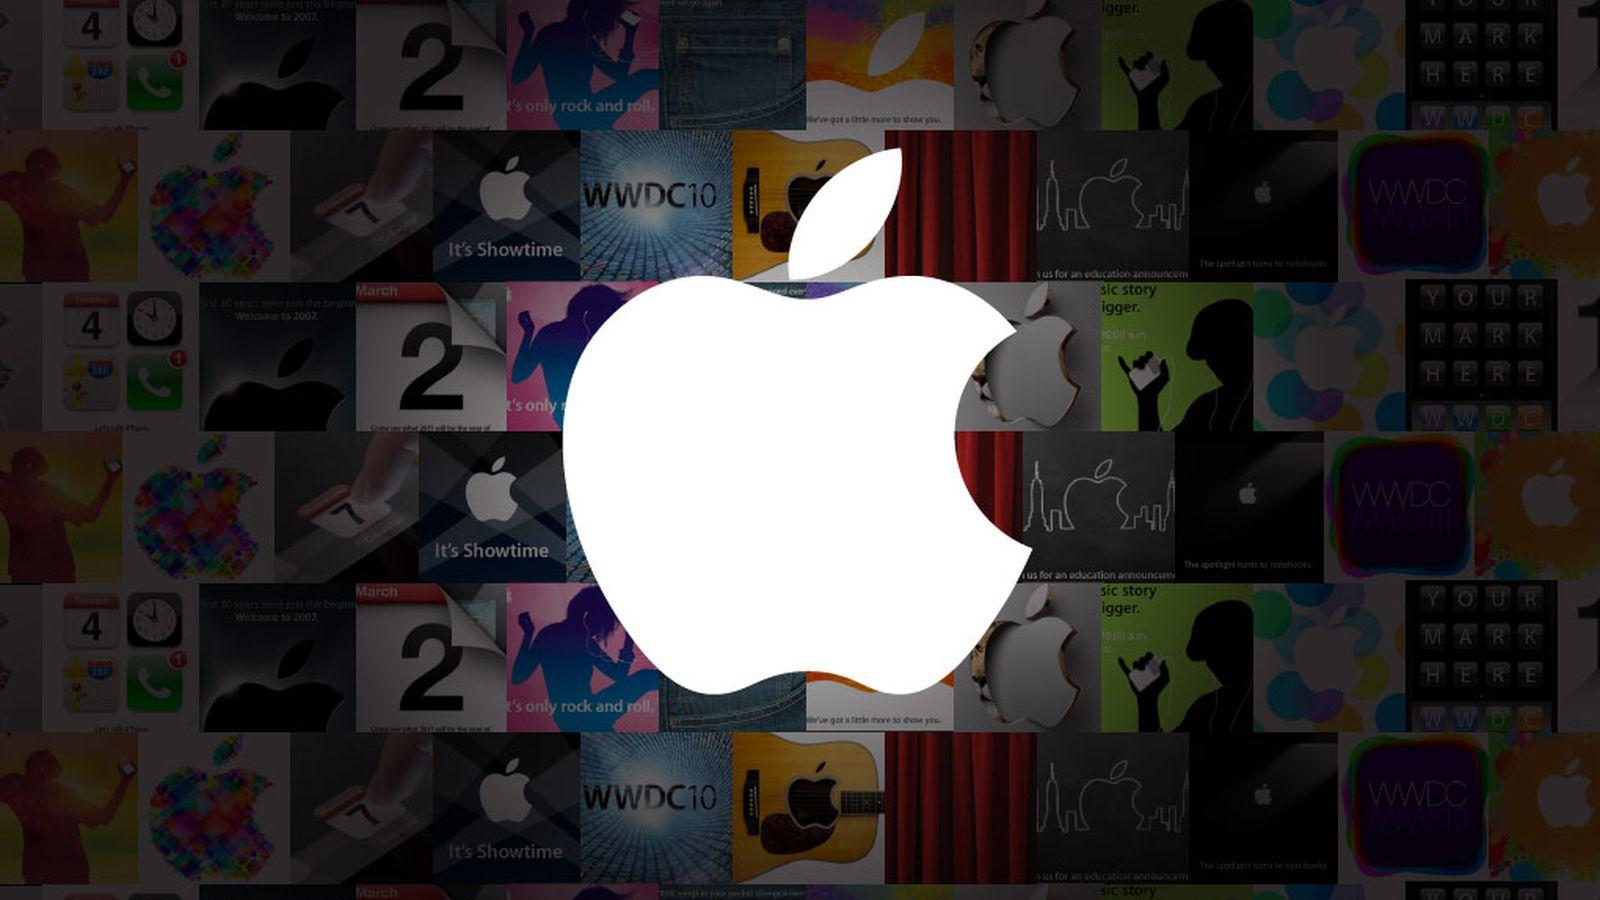 21 октября Apple планирует провести еще одну презентацию